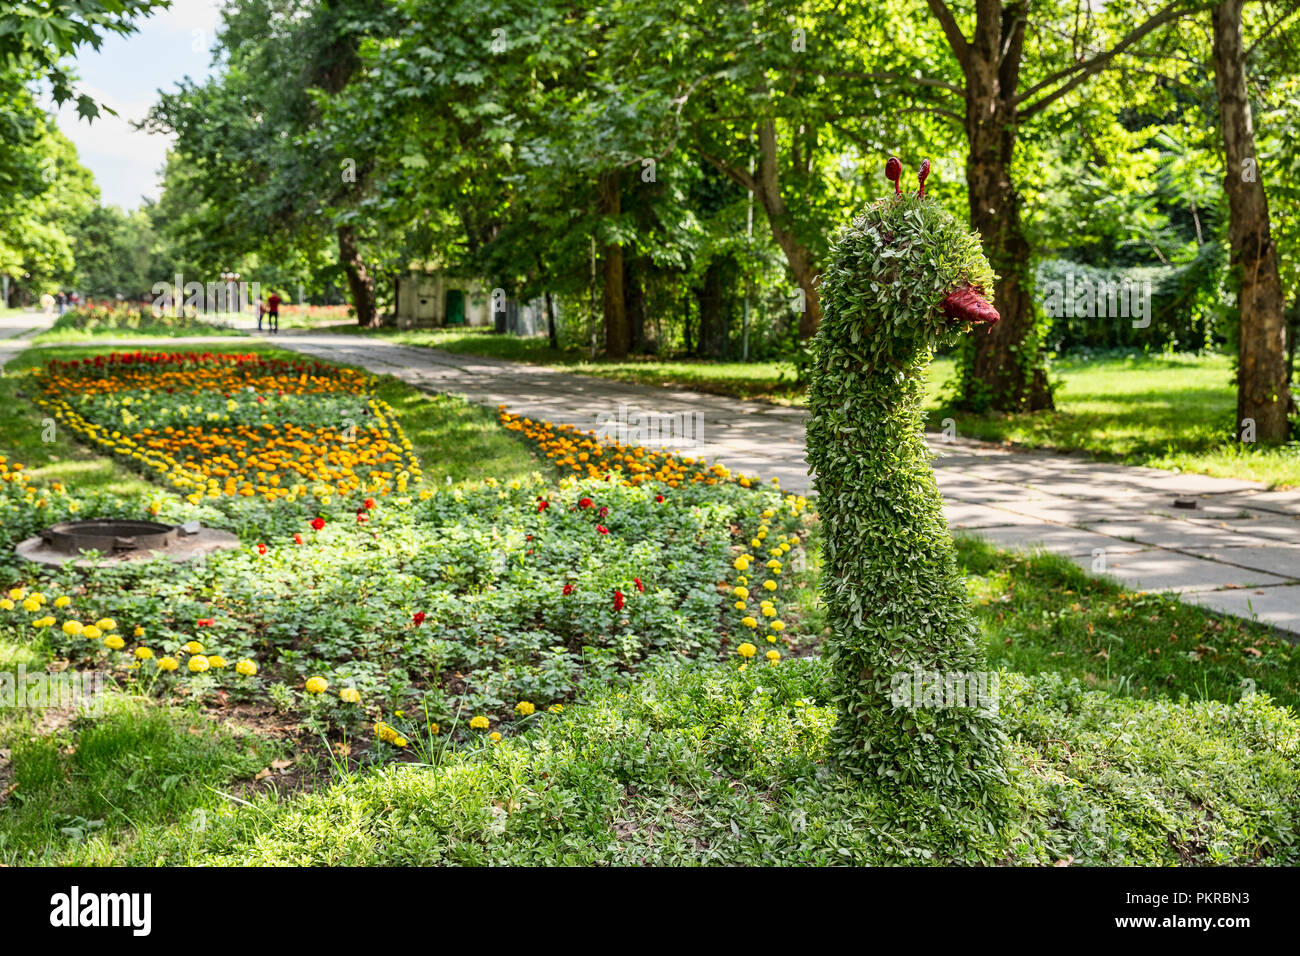 Images of Таттыбюбю ТурсунбаевойPanfilov Square in Bishkek, the wonderful, walkable capital of Kyrgyzstan. - Stock Image